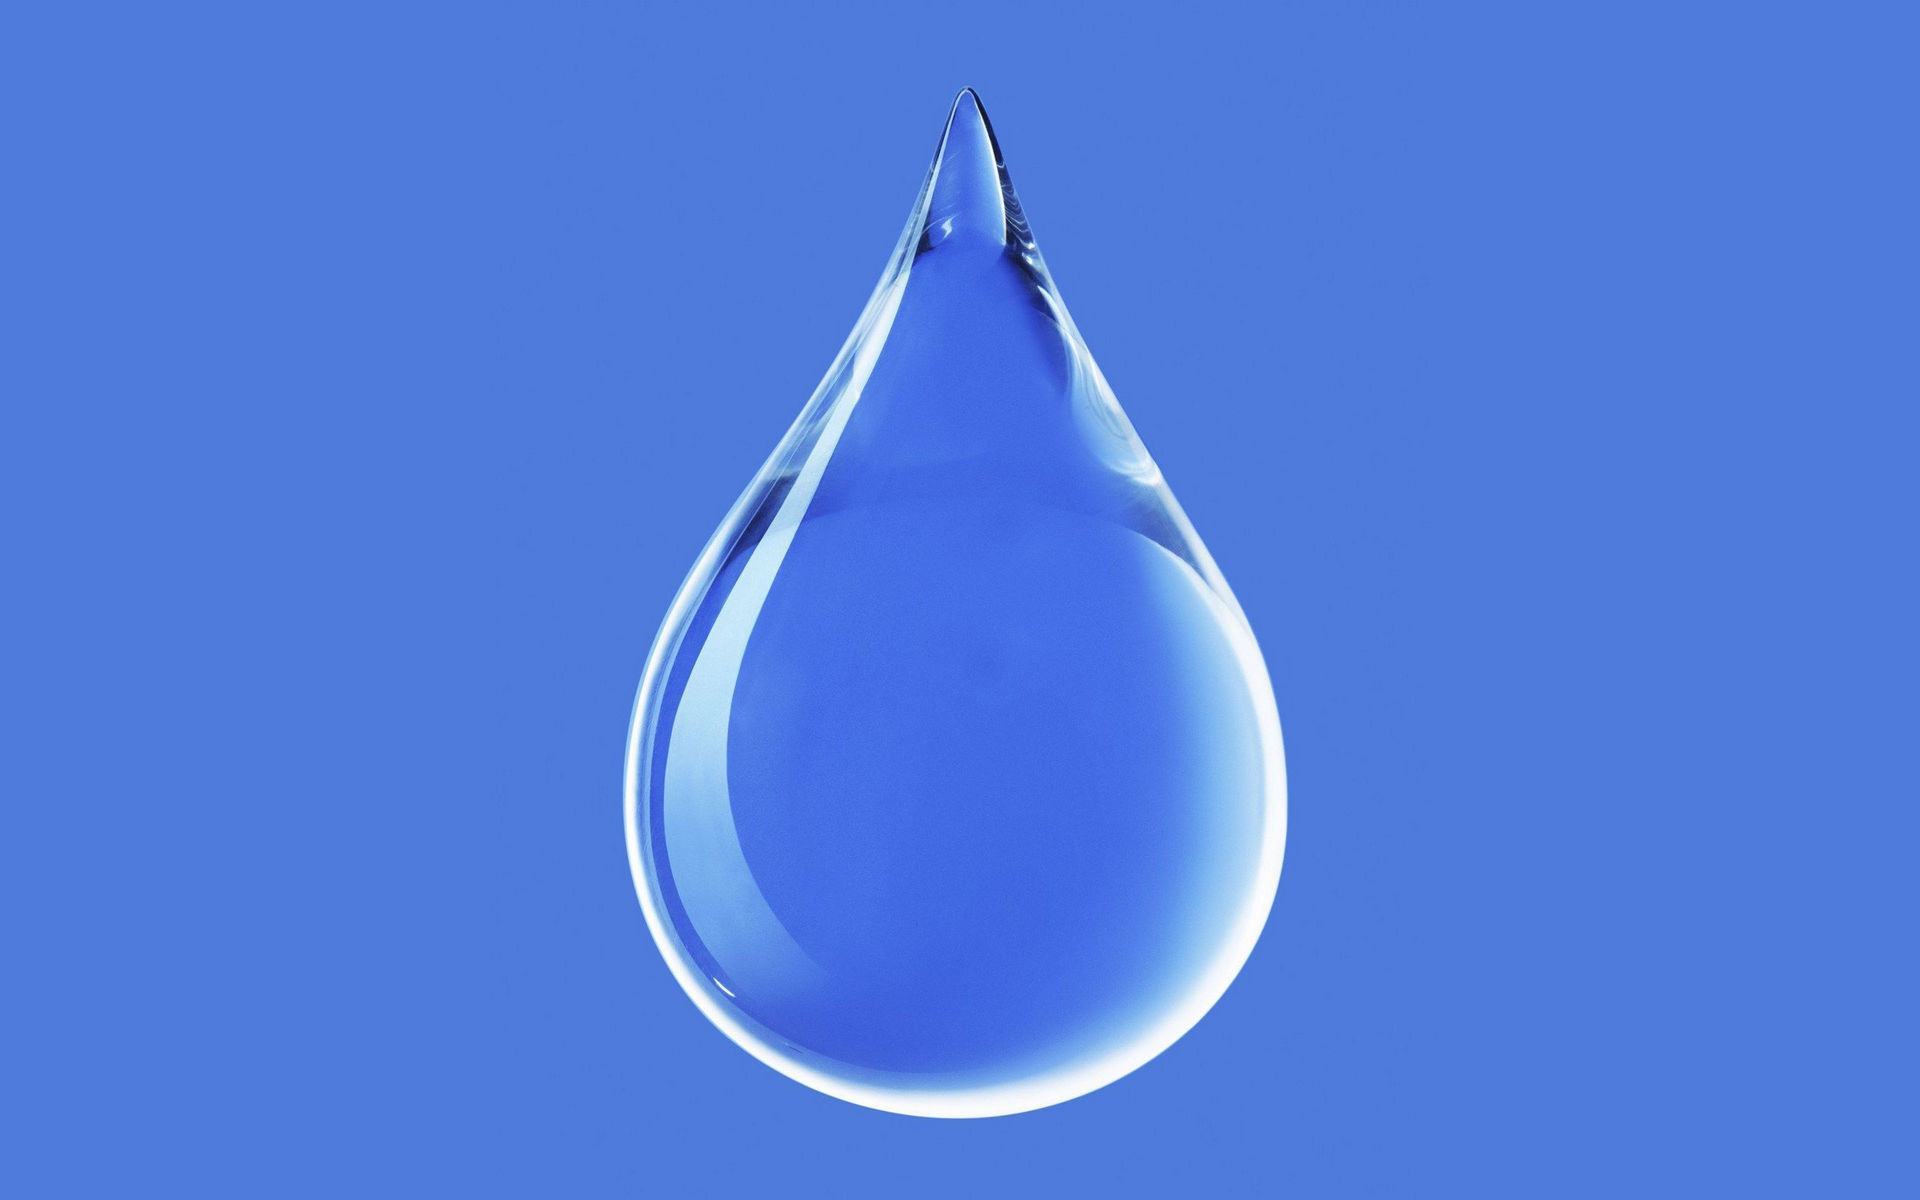 капля, вода, прозрачная